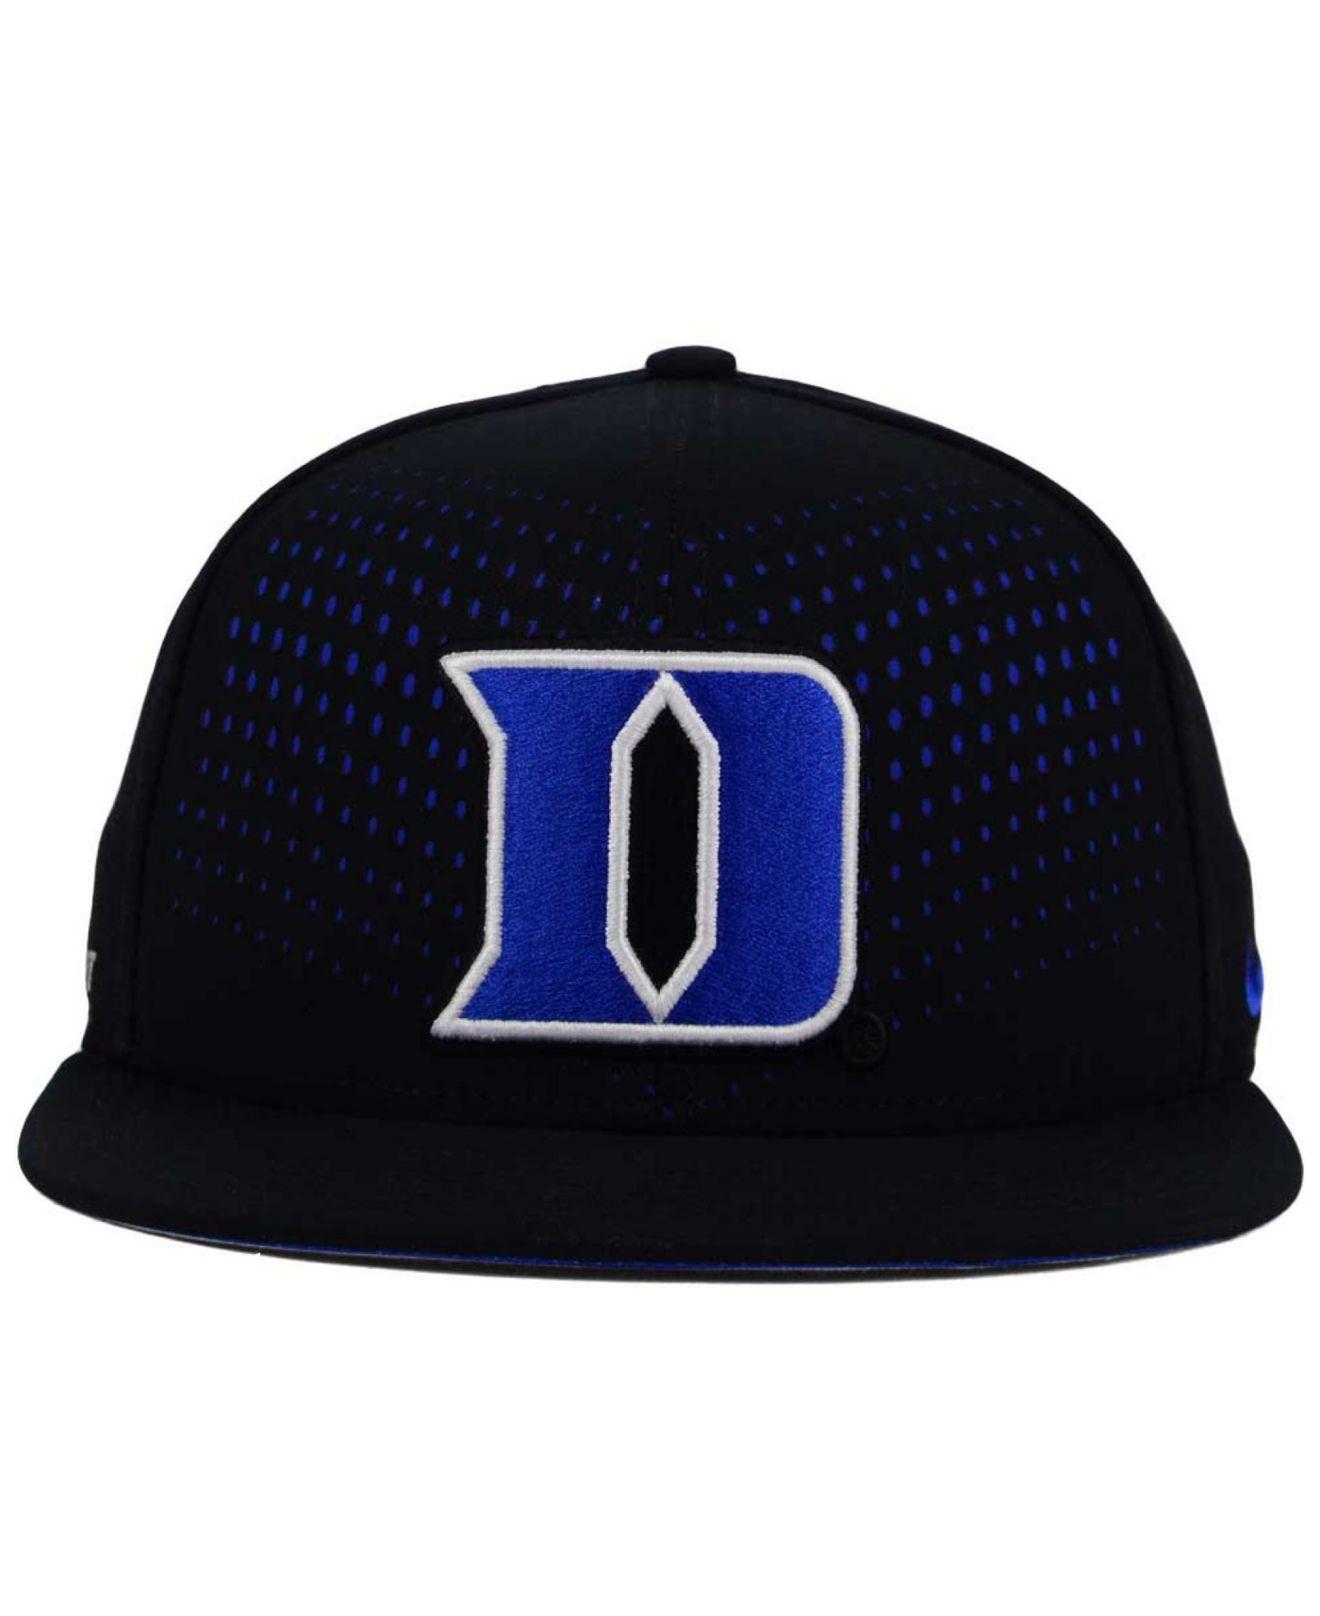 4e87df0879e5d ... australia lyst nike duke blue devils true seasonal snapback cap in  black for men 066b4 53af6